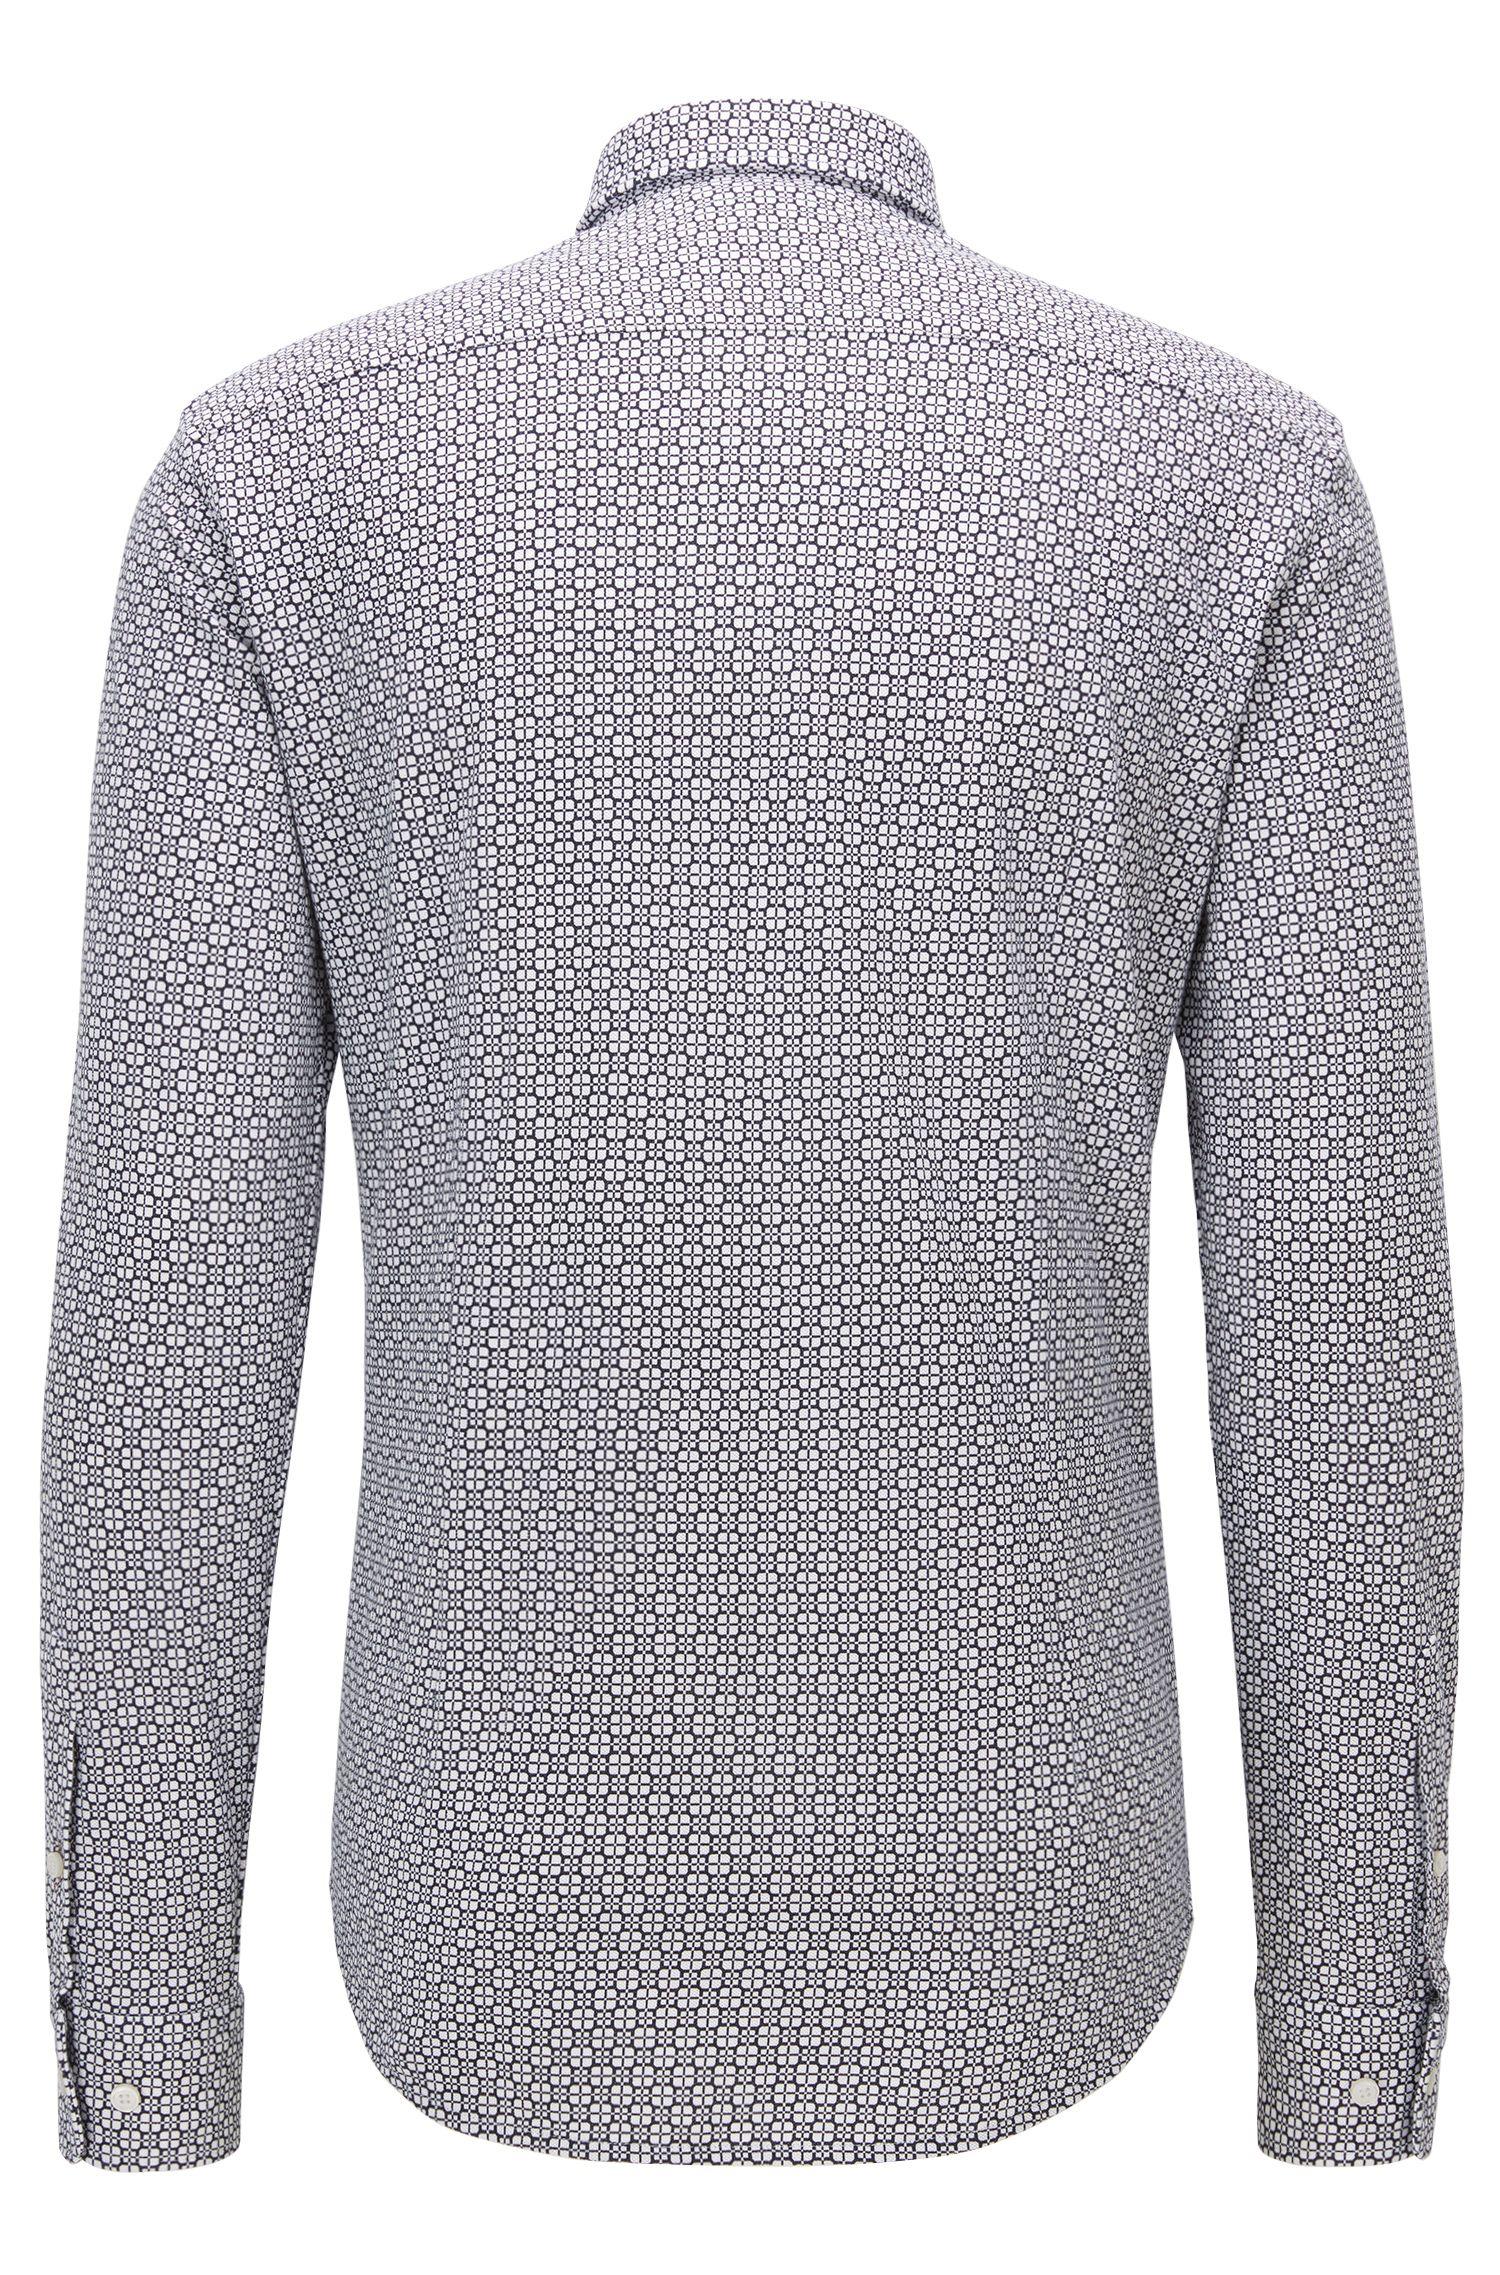 Square-Print Cotton Button Down Shirt, Slim Fit | Ronni, Dark Blue